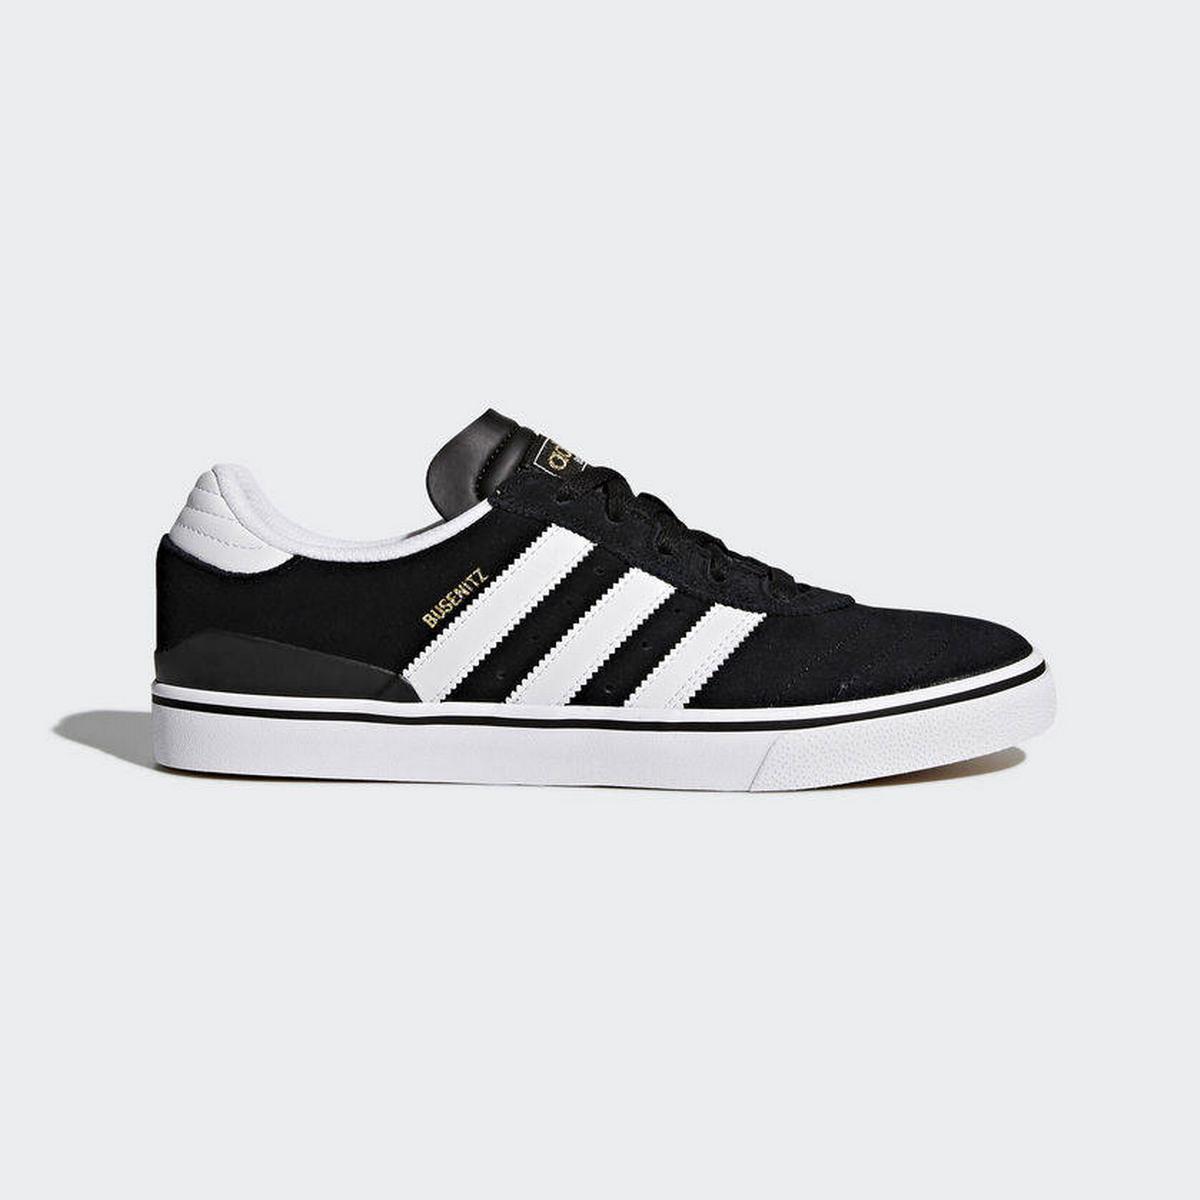 Adidas busenitz • Hitta det lägsta priset hos PriceRunner nu »